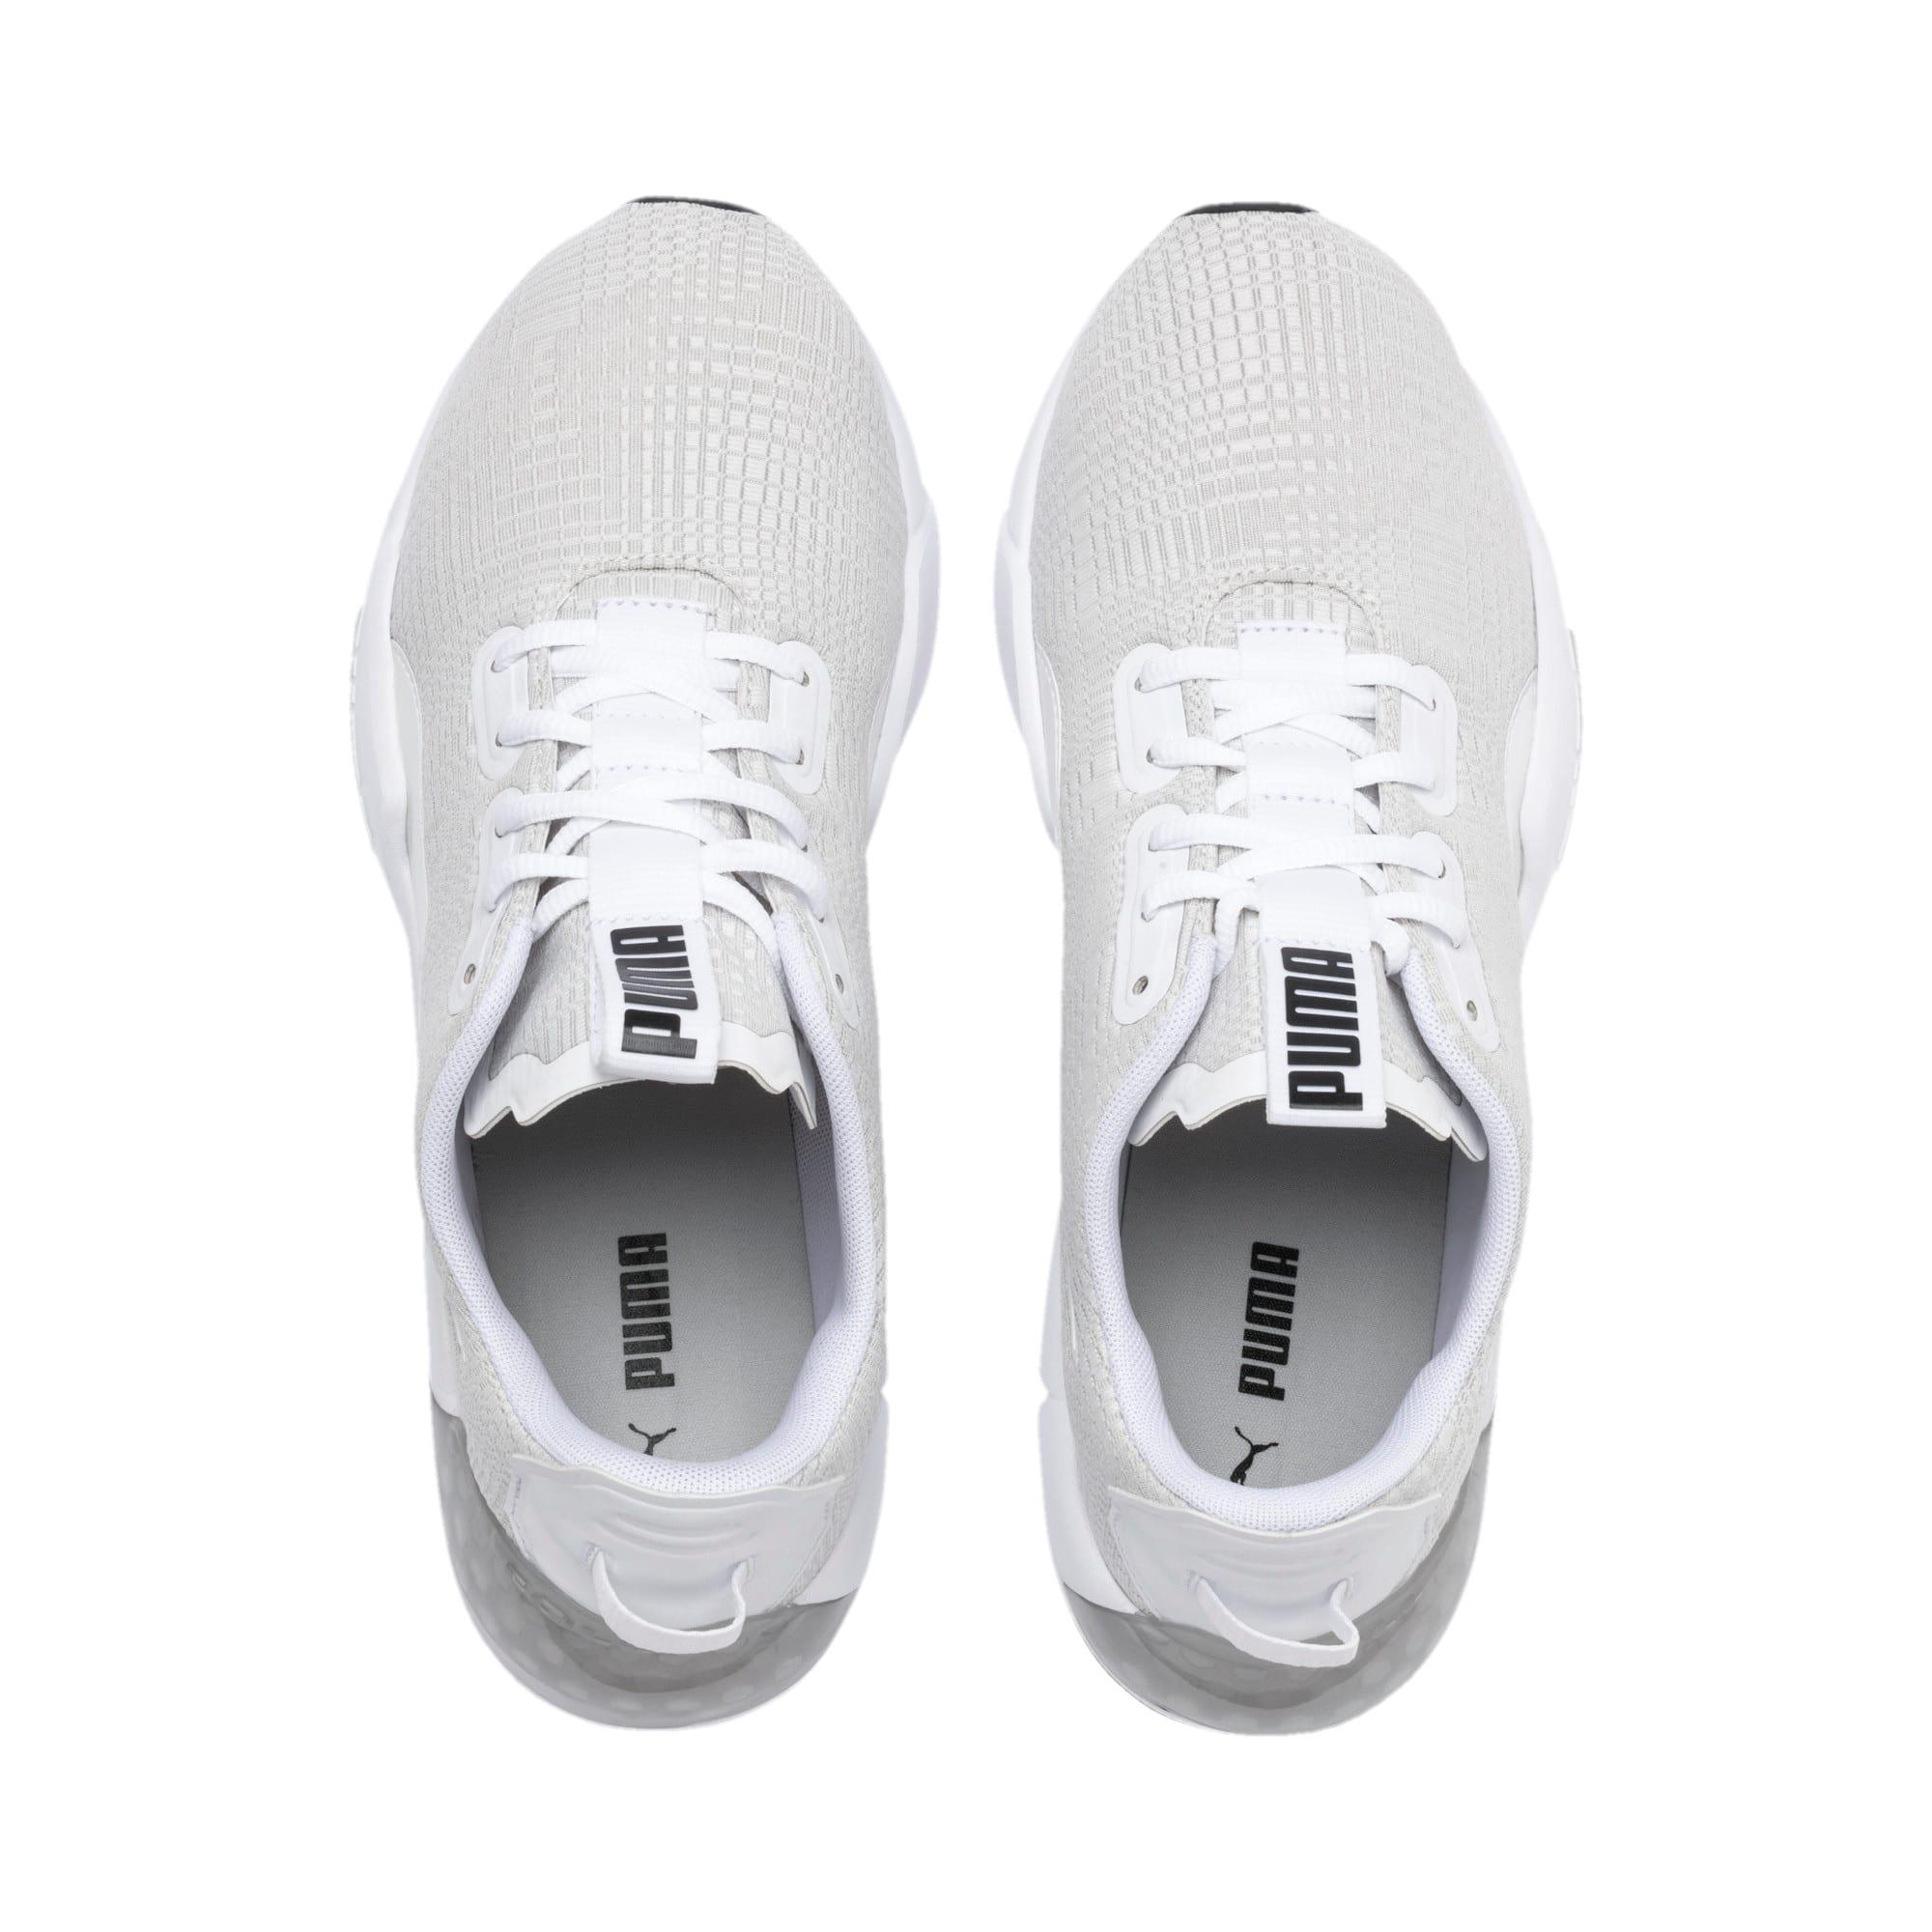 Thumbnail 7 of CELL Phase Lights Men's Running Shoes, Puma White-Gray Violet, medium